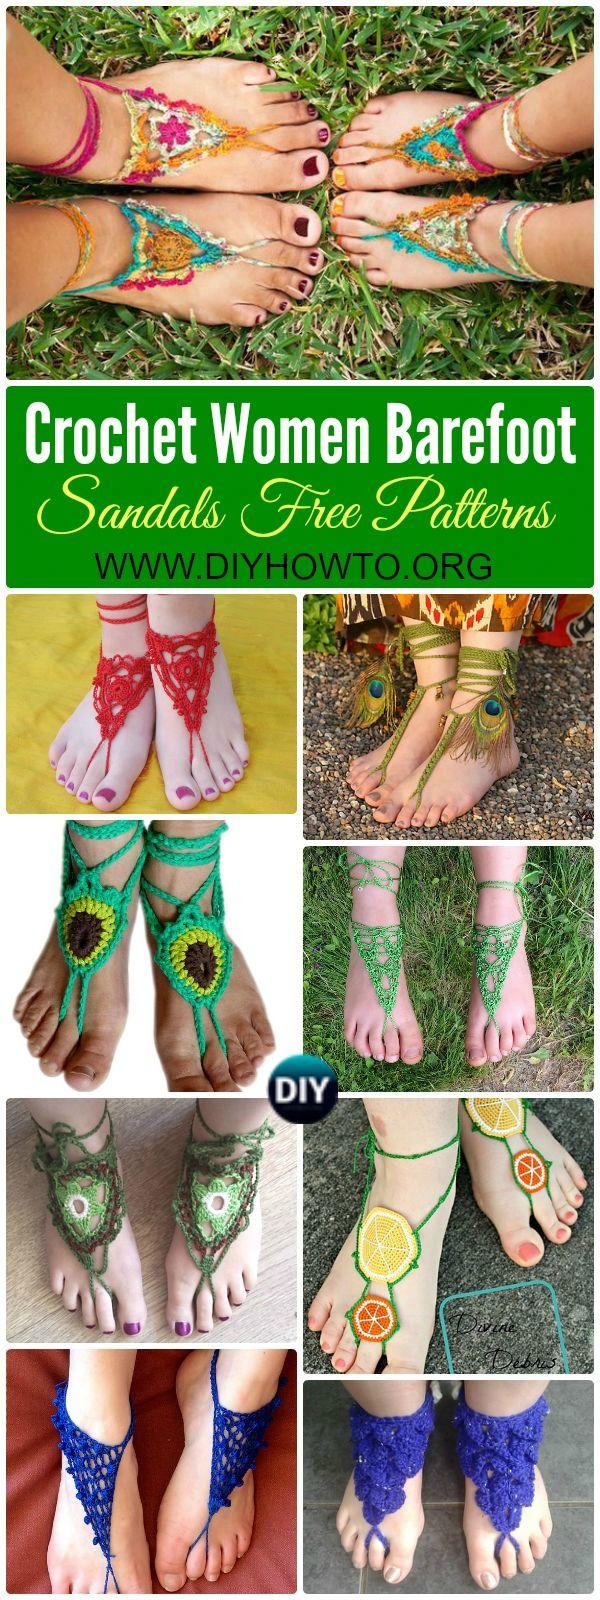 Crochet Women Barefoot Sandal Anklets Free Patterns: Crochet Adult Barefoot Sandals, Beach Sandals, Bridal Sandals via @diyhowto